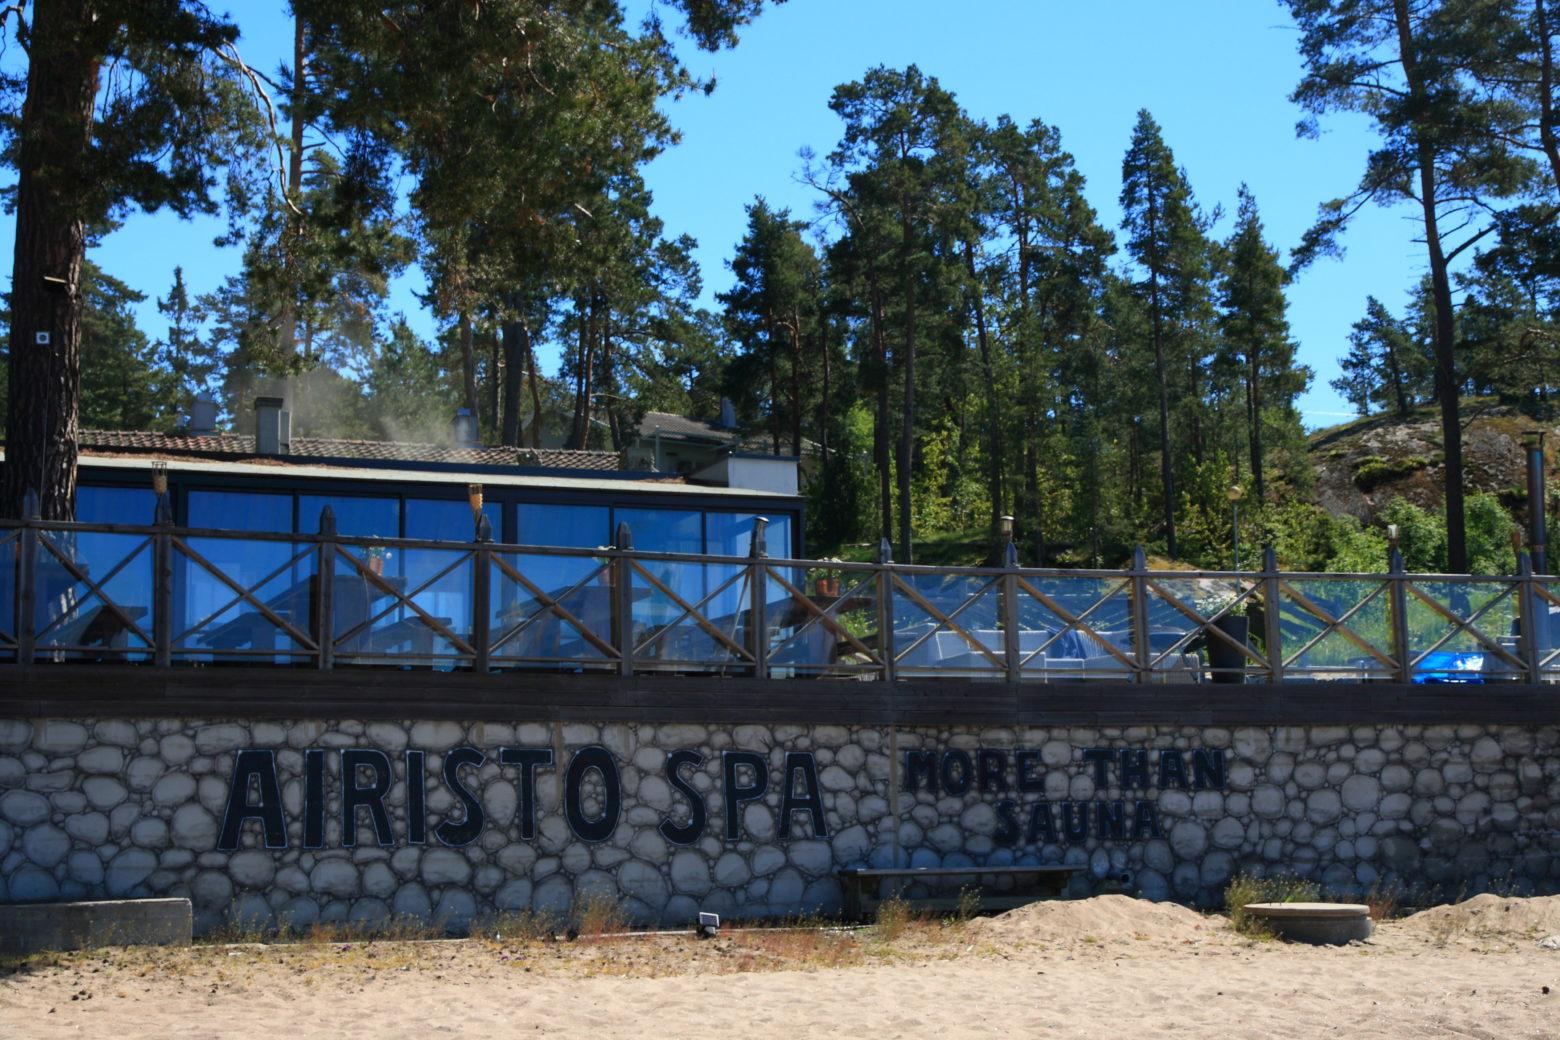 Airisto Spa Paraisilla